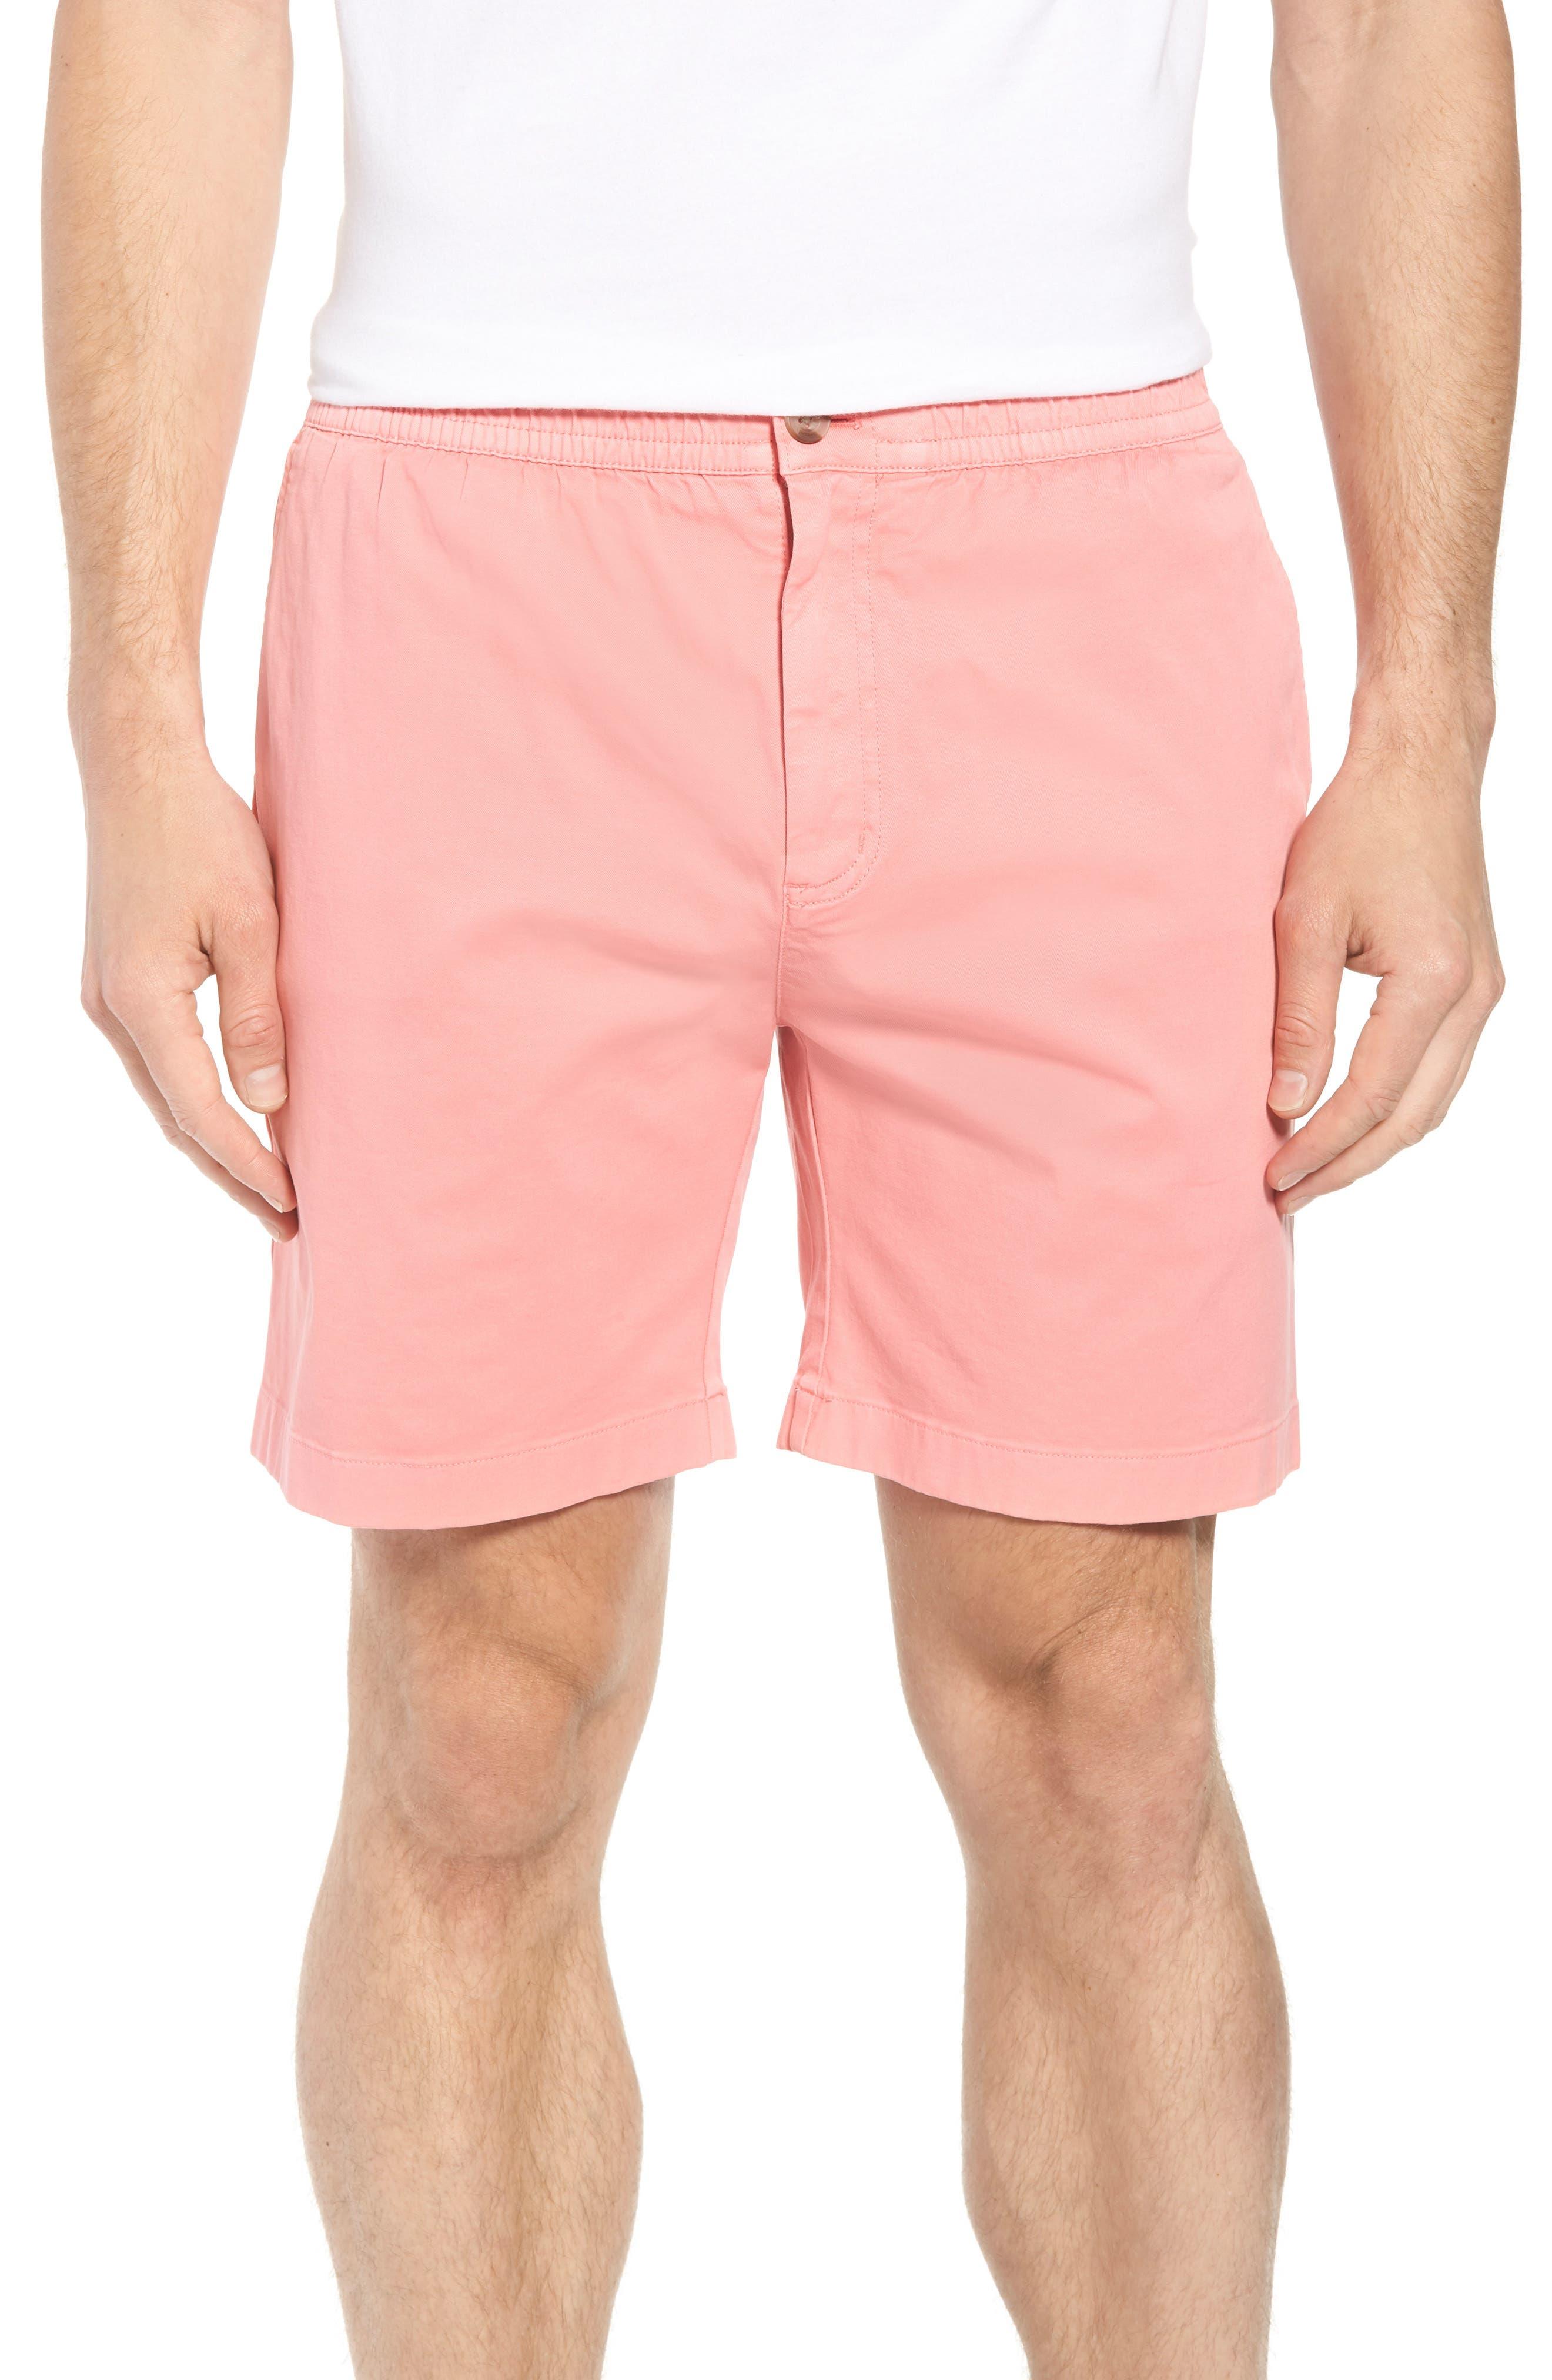 Jetty Stretch Cotton Shorts,                         Main,                         color, Cape Coral